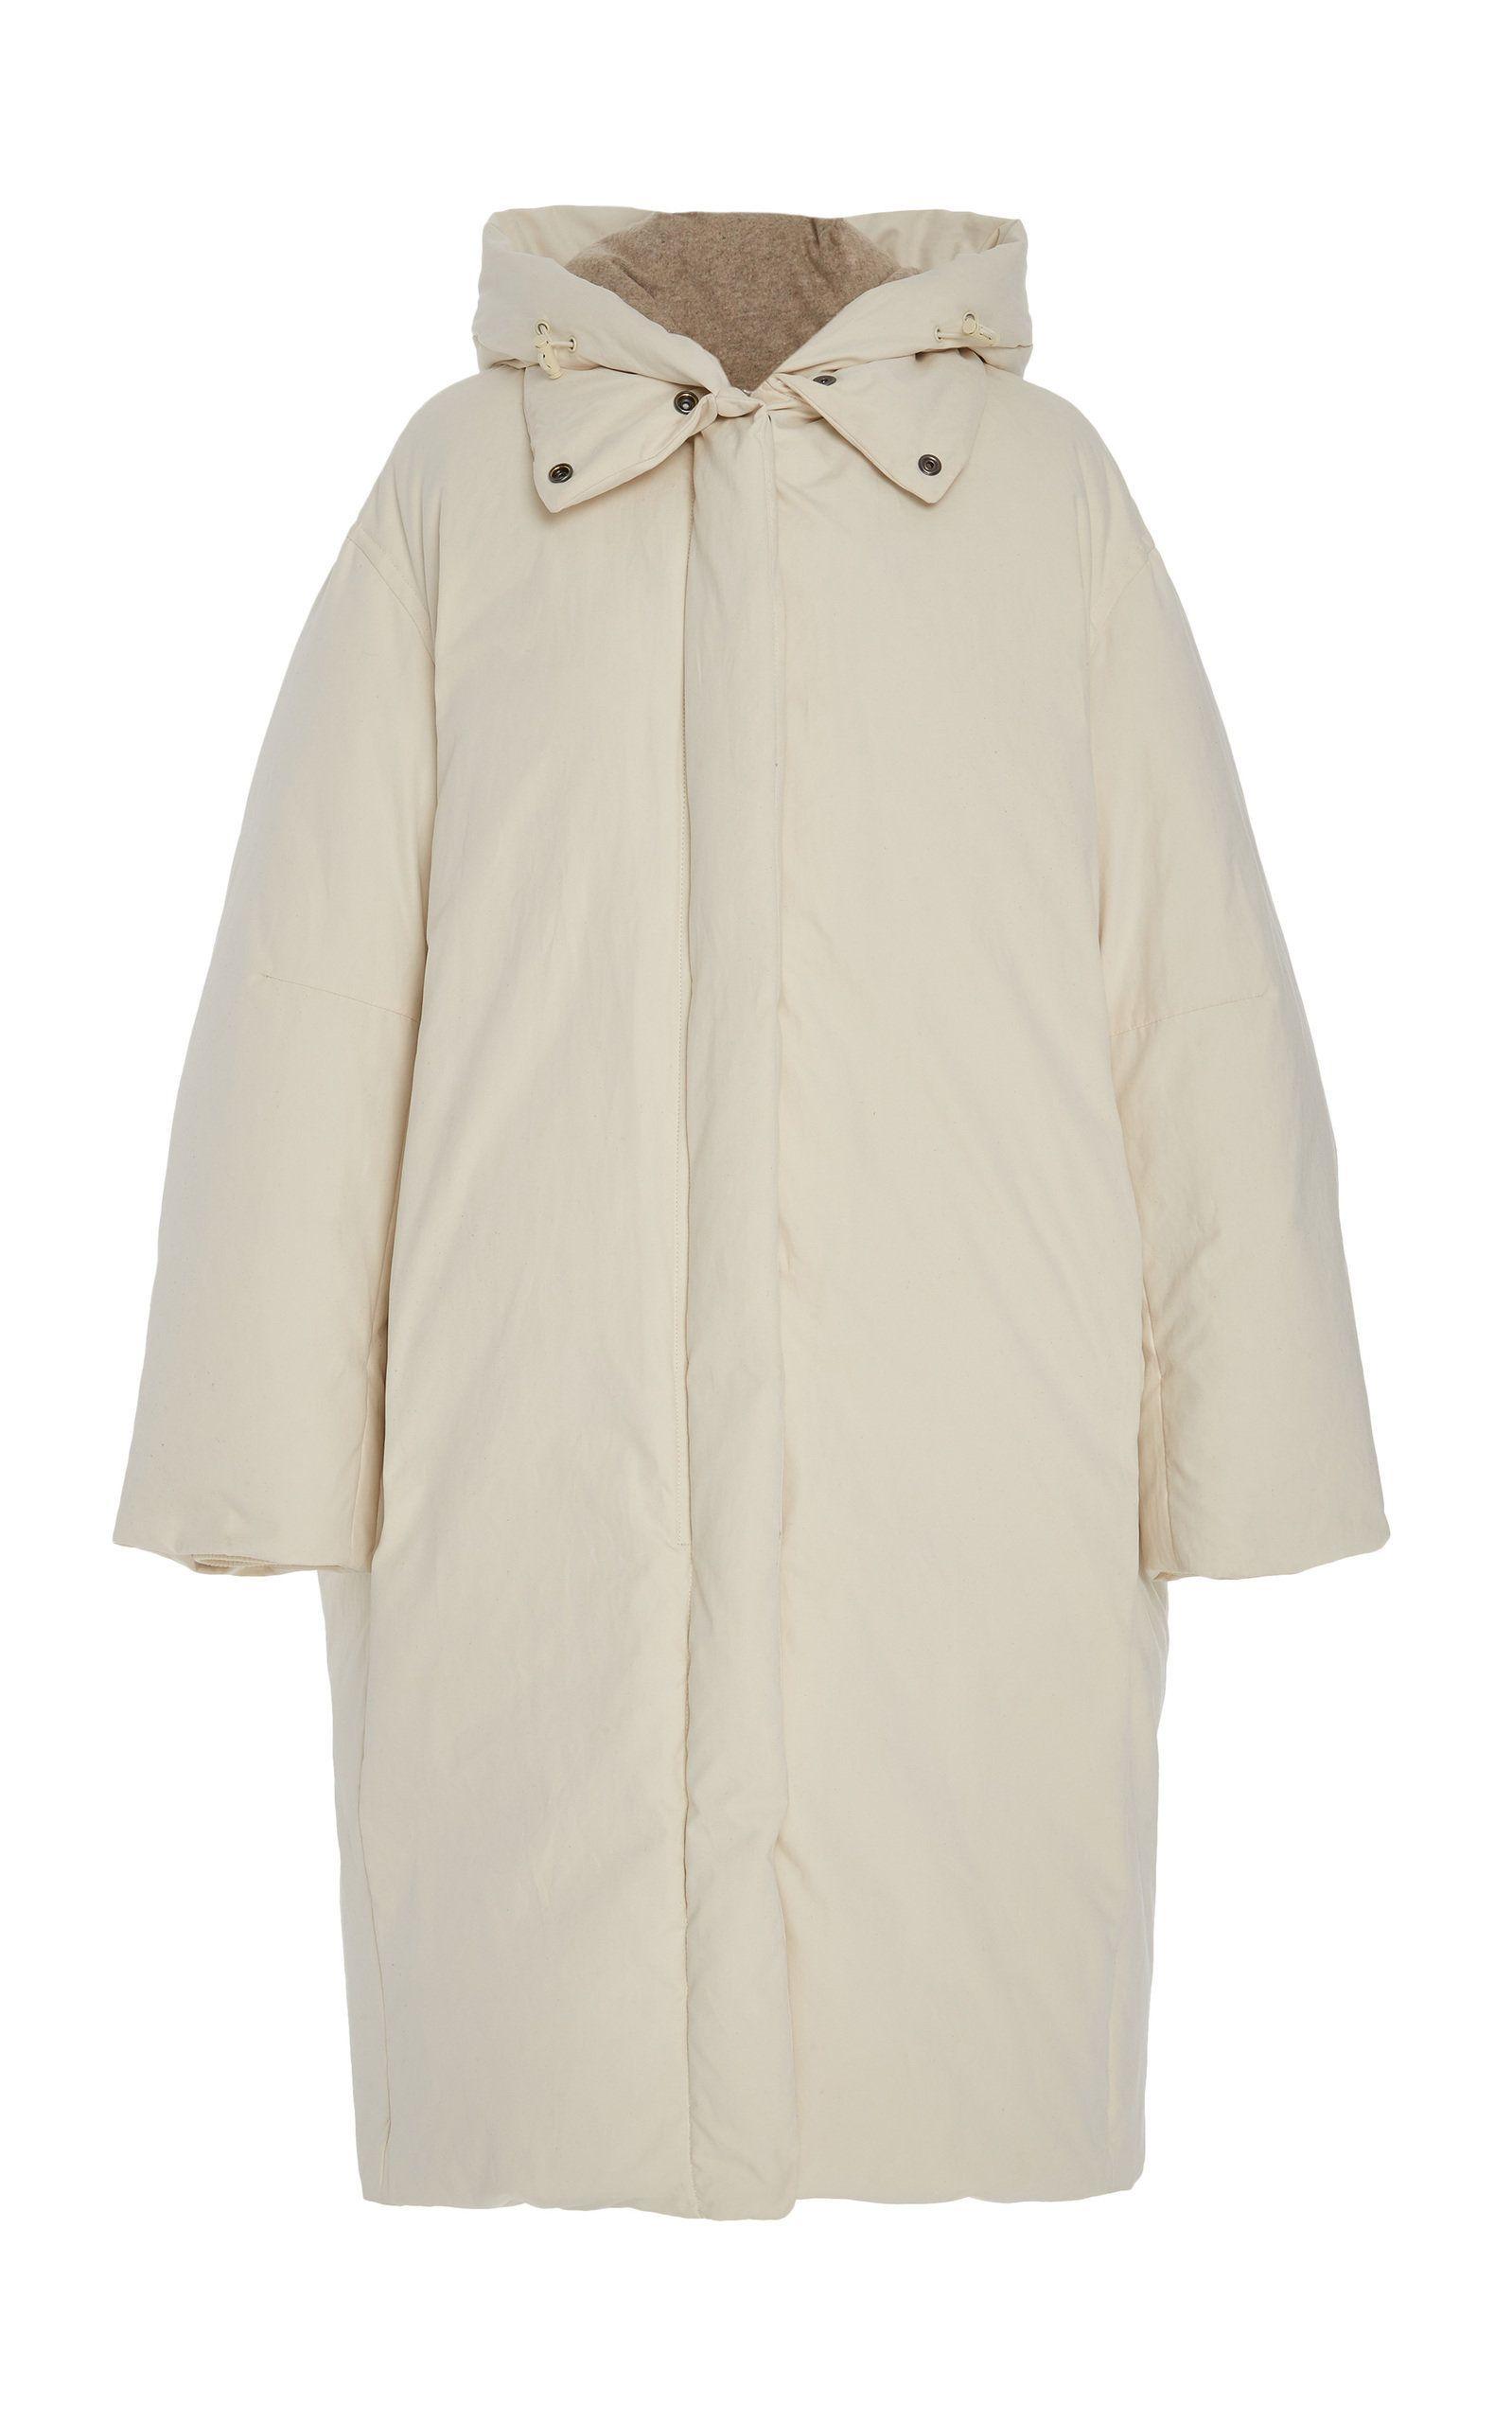 Vince Oversized Hooded Shell Down Coat Down Coat Coat White Puffer Coat [ 2560 x 1598 Pixel ]